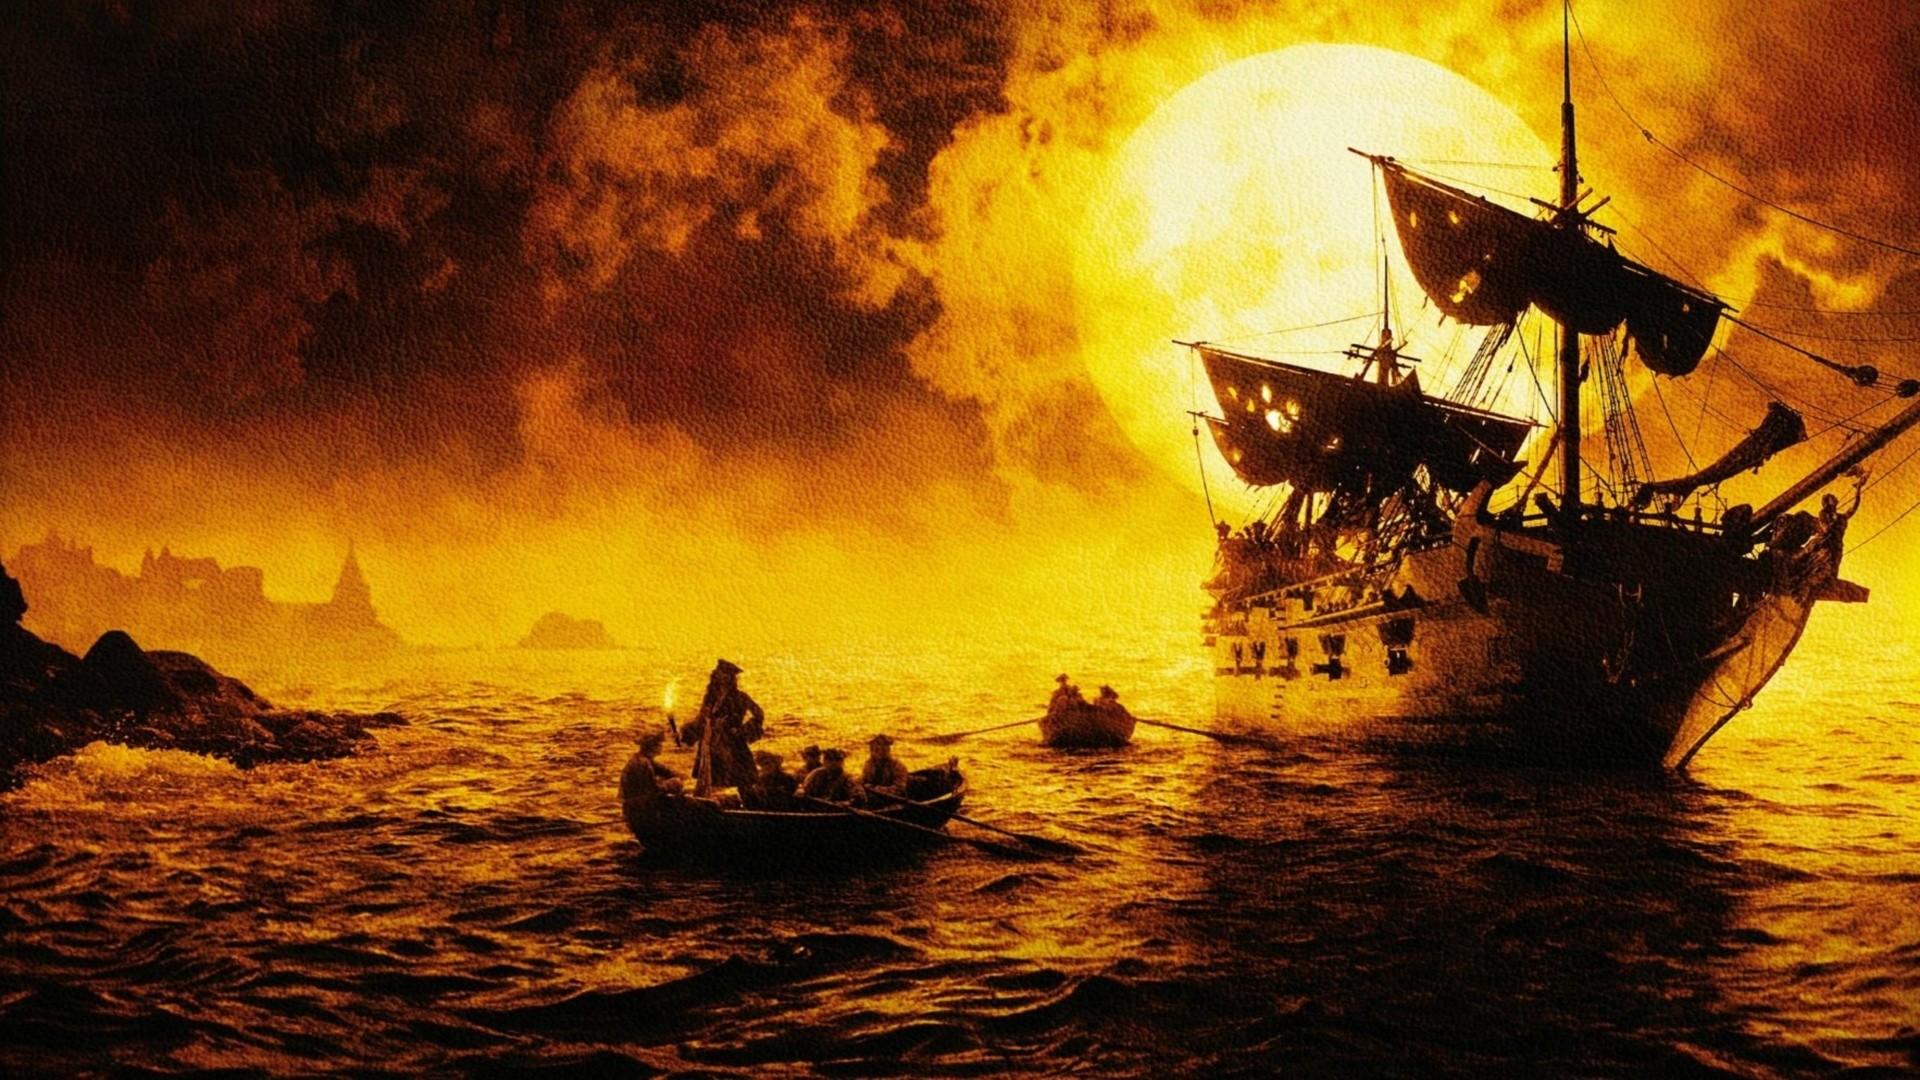 42 Pirate Ship Wallpaper Hd On Wallpapersafari